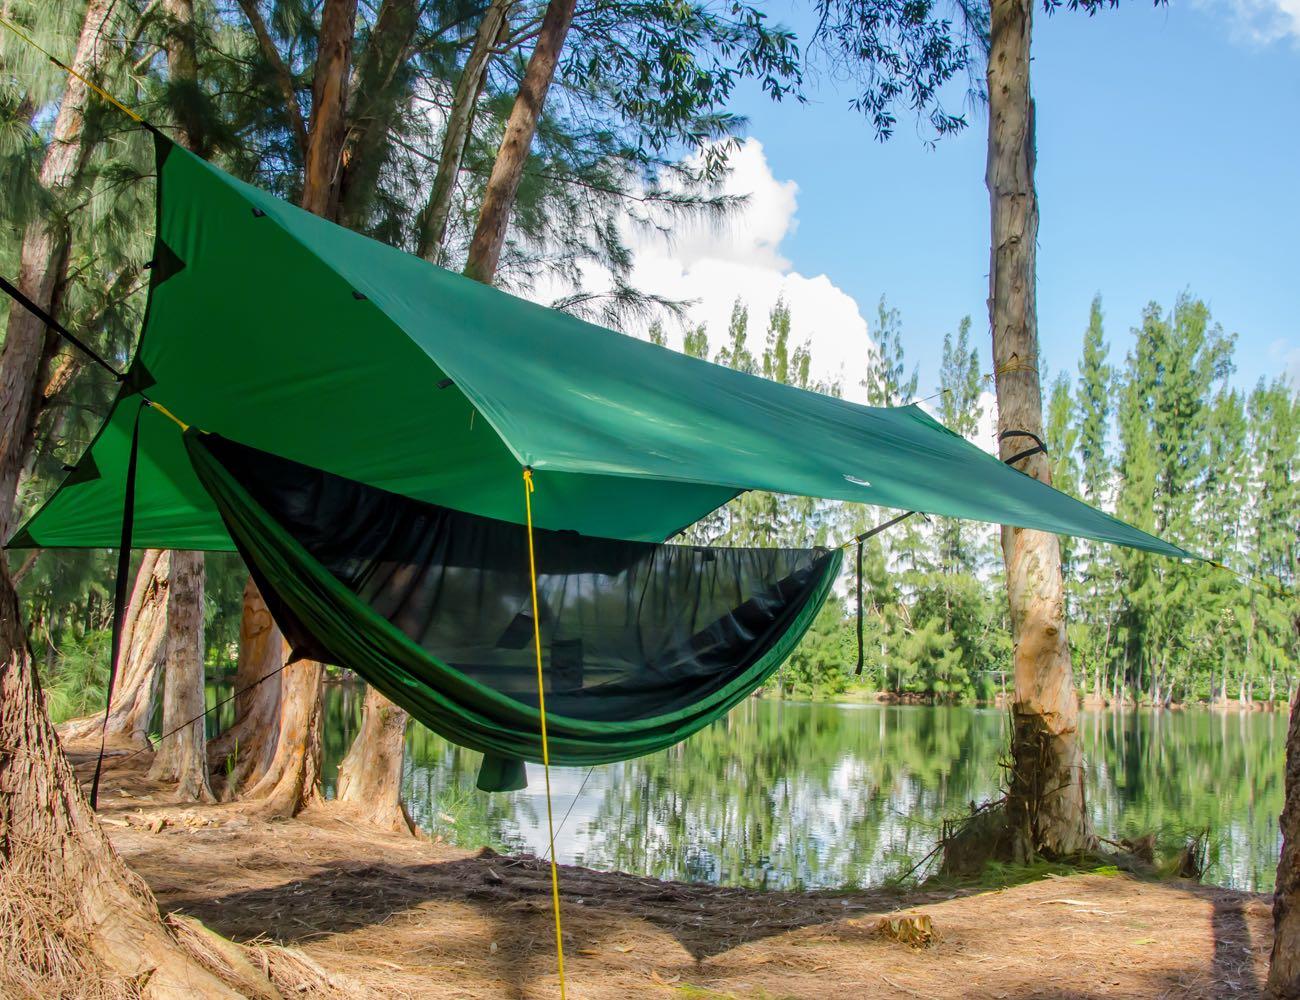 Apex+Camping+Shelter+%26amp%3B+Hammock+Camping+Tarp+For+Everyone